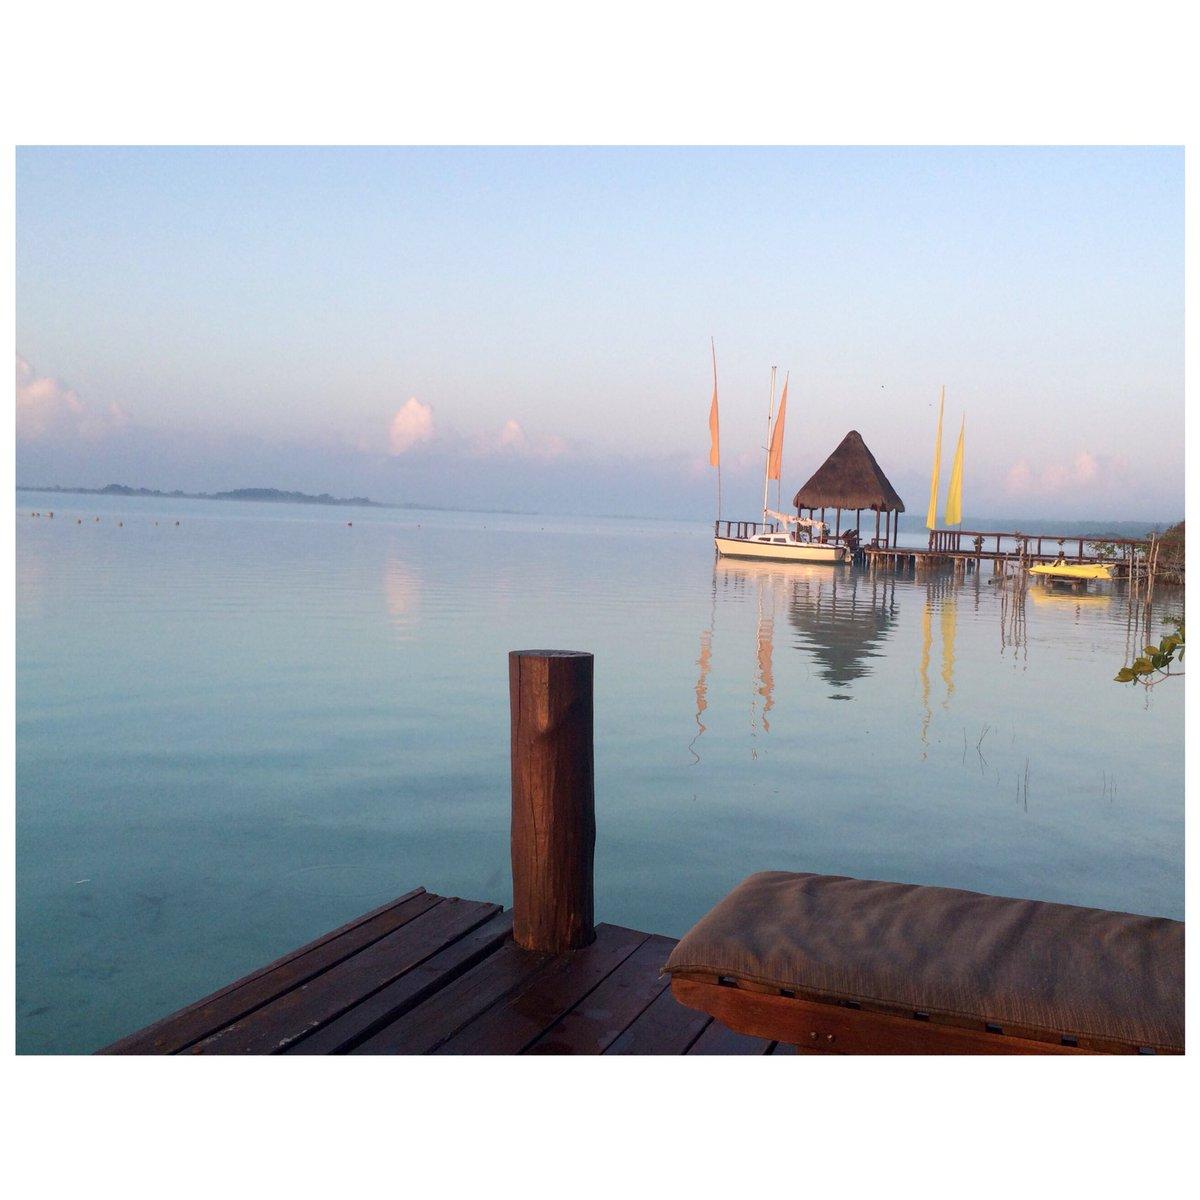 FBF, take me back to Lake Bacalar #sunset #lakebacalar #lakeofsevencolours #mexico #water #flag #jetty #fbf https://t.co/HFI8JzahwL